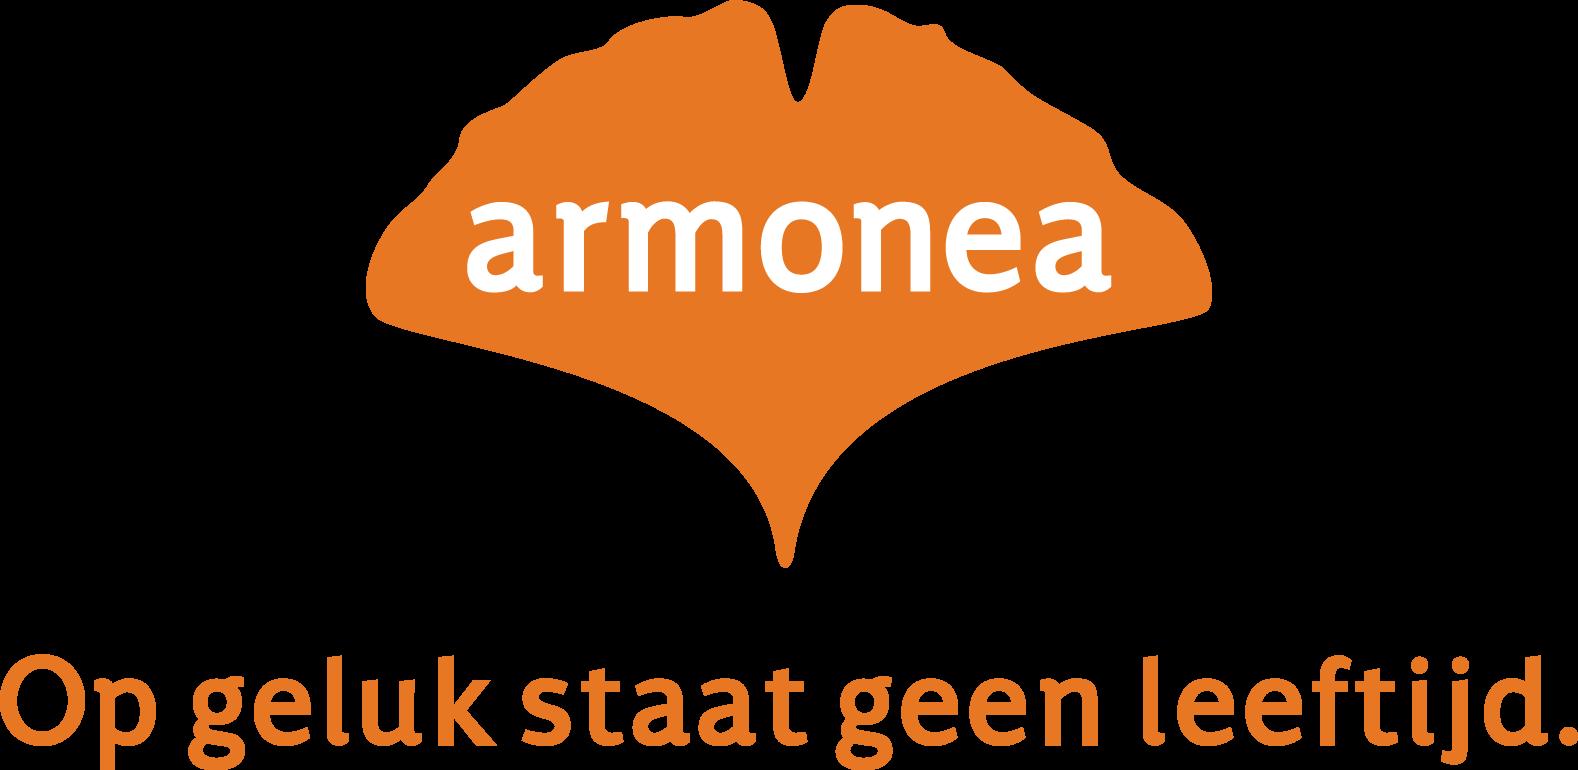 Armonea_rgb_pos_tcnl_orange_large